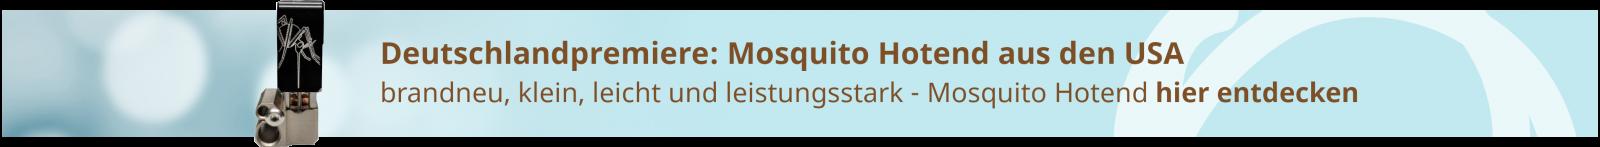 Mosquito Hotend hier entdecken